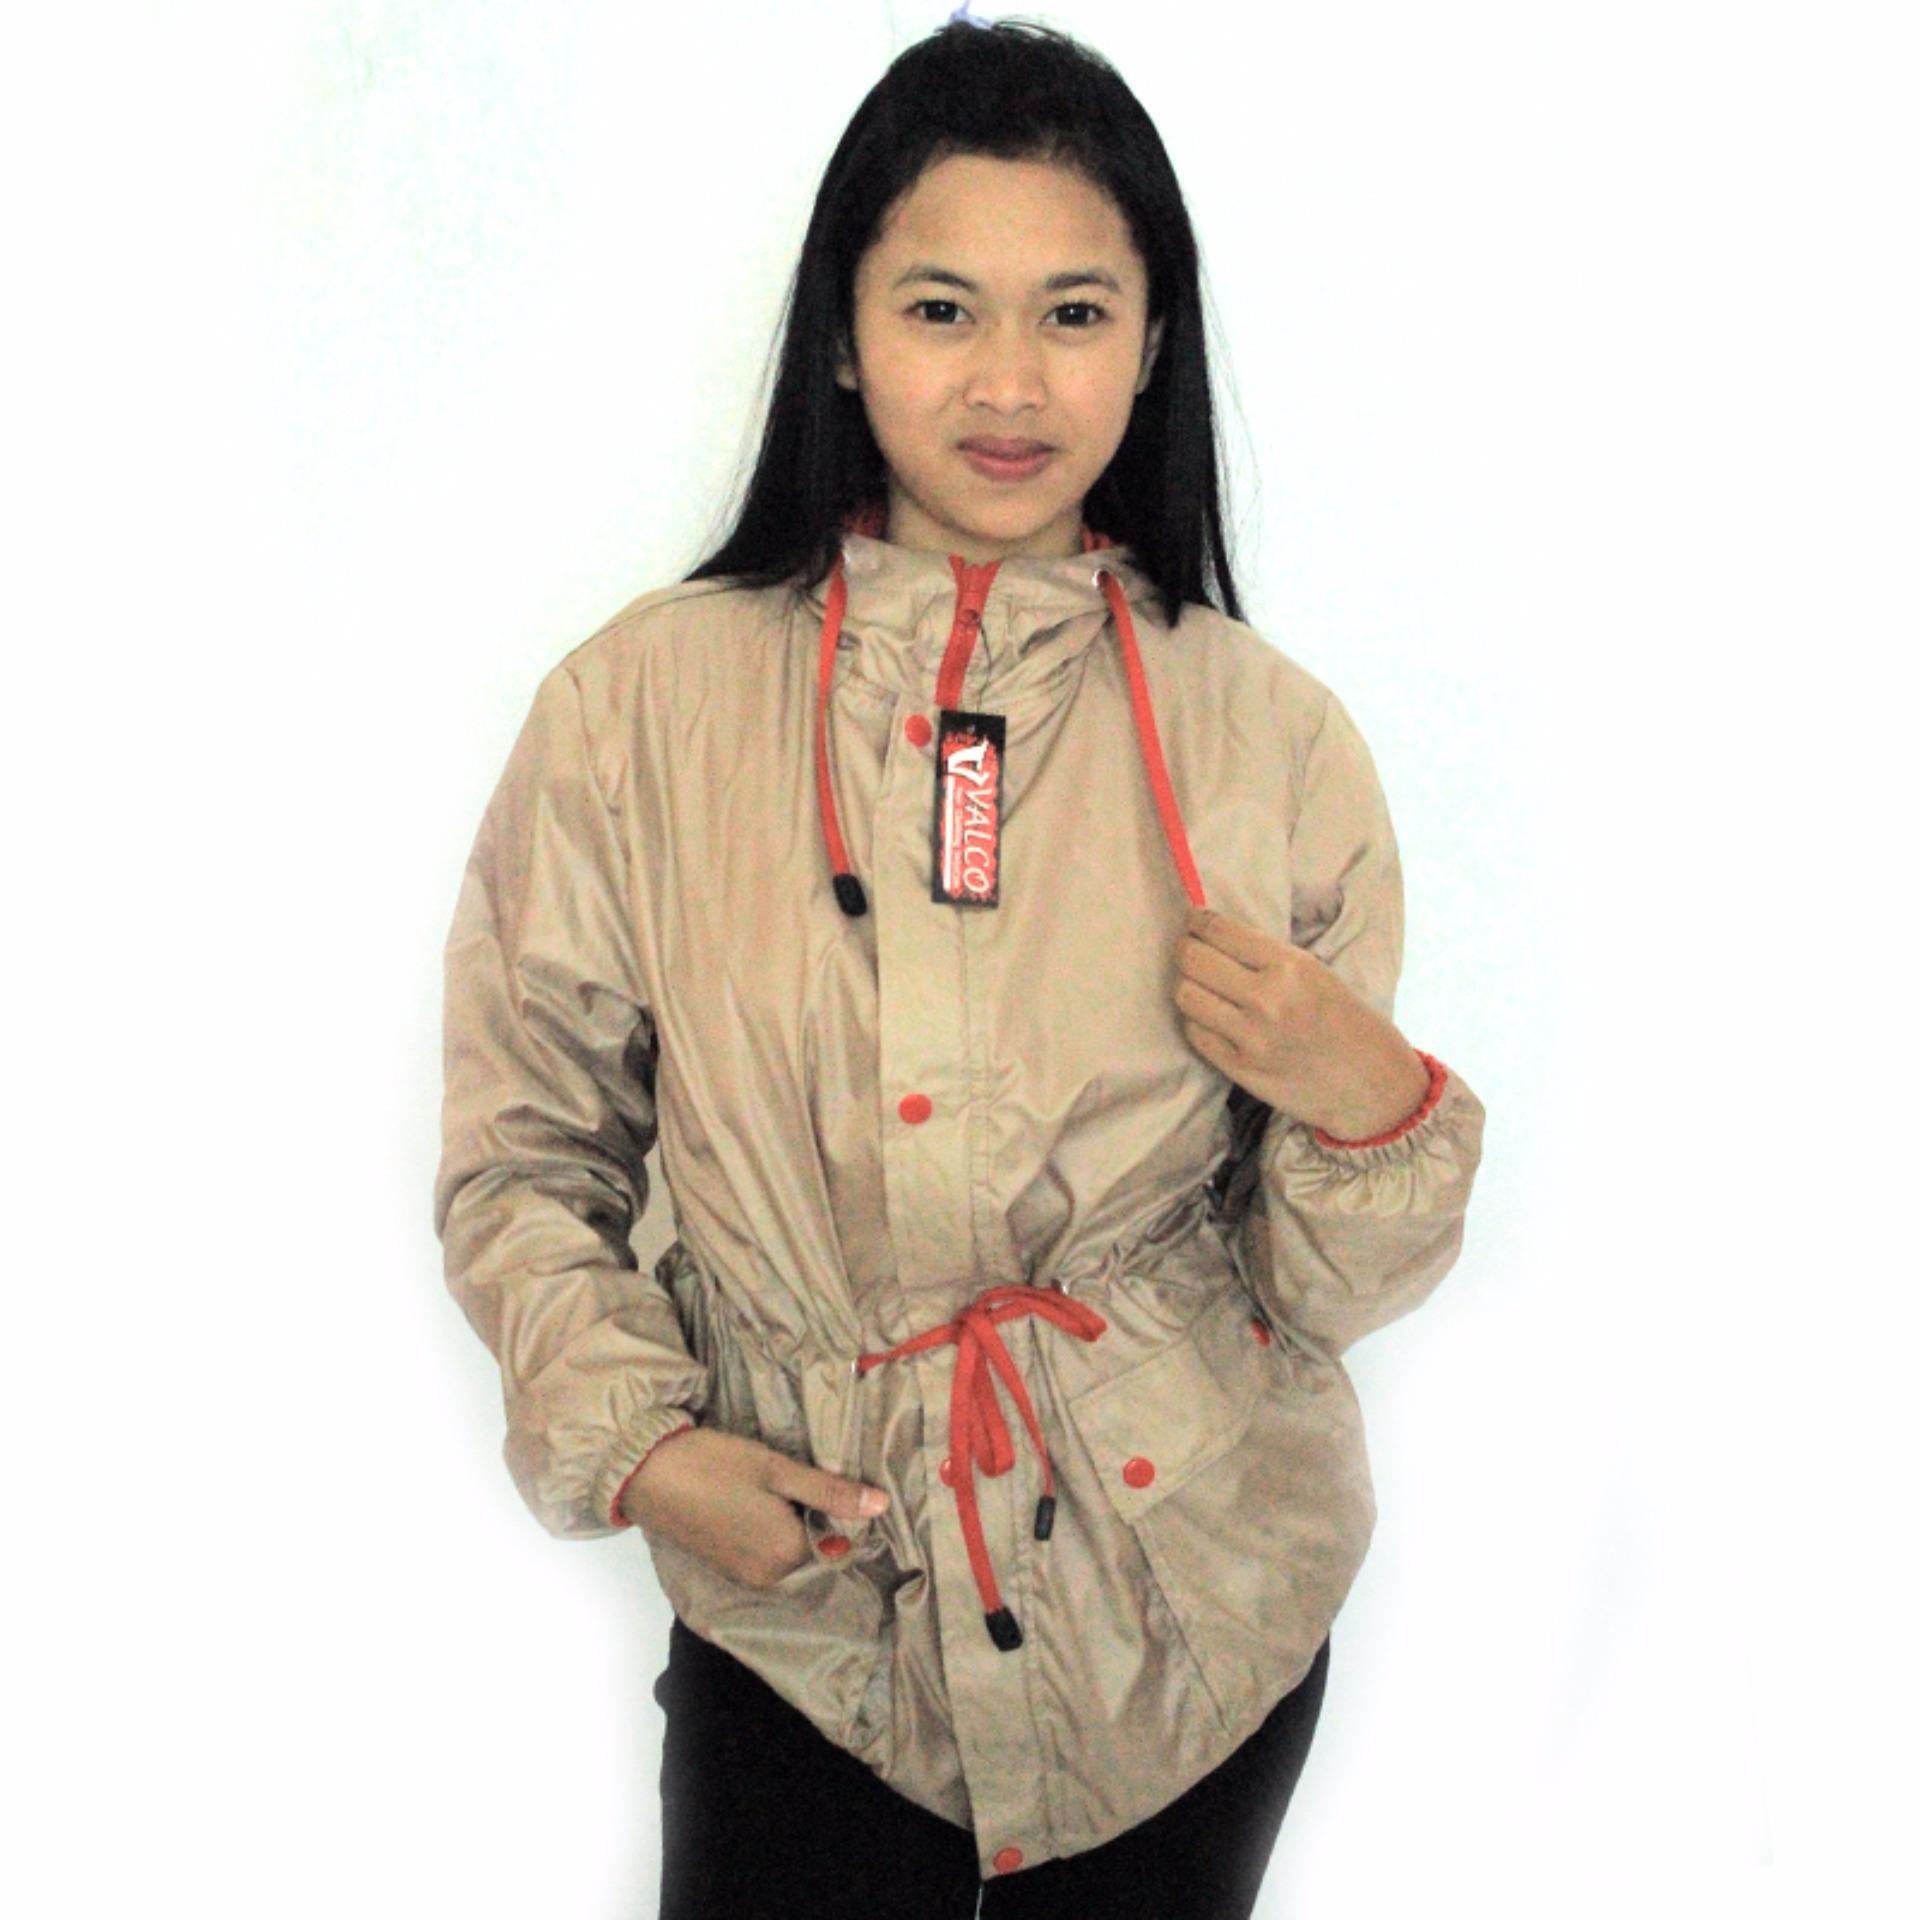 Bandingkan Toko Valco Jaket Parasut Bolak Balik Wanita - Coffee/Coklat - Merah sale -